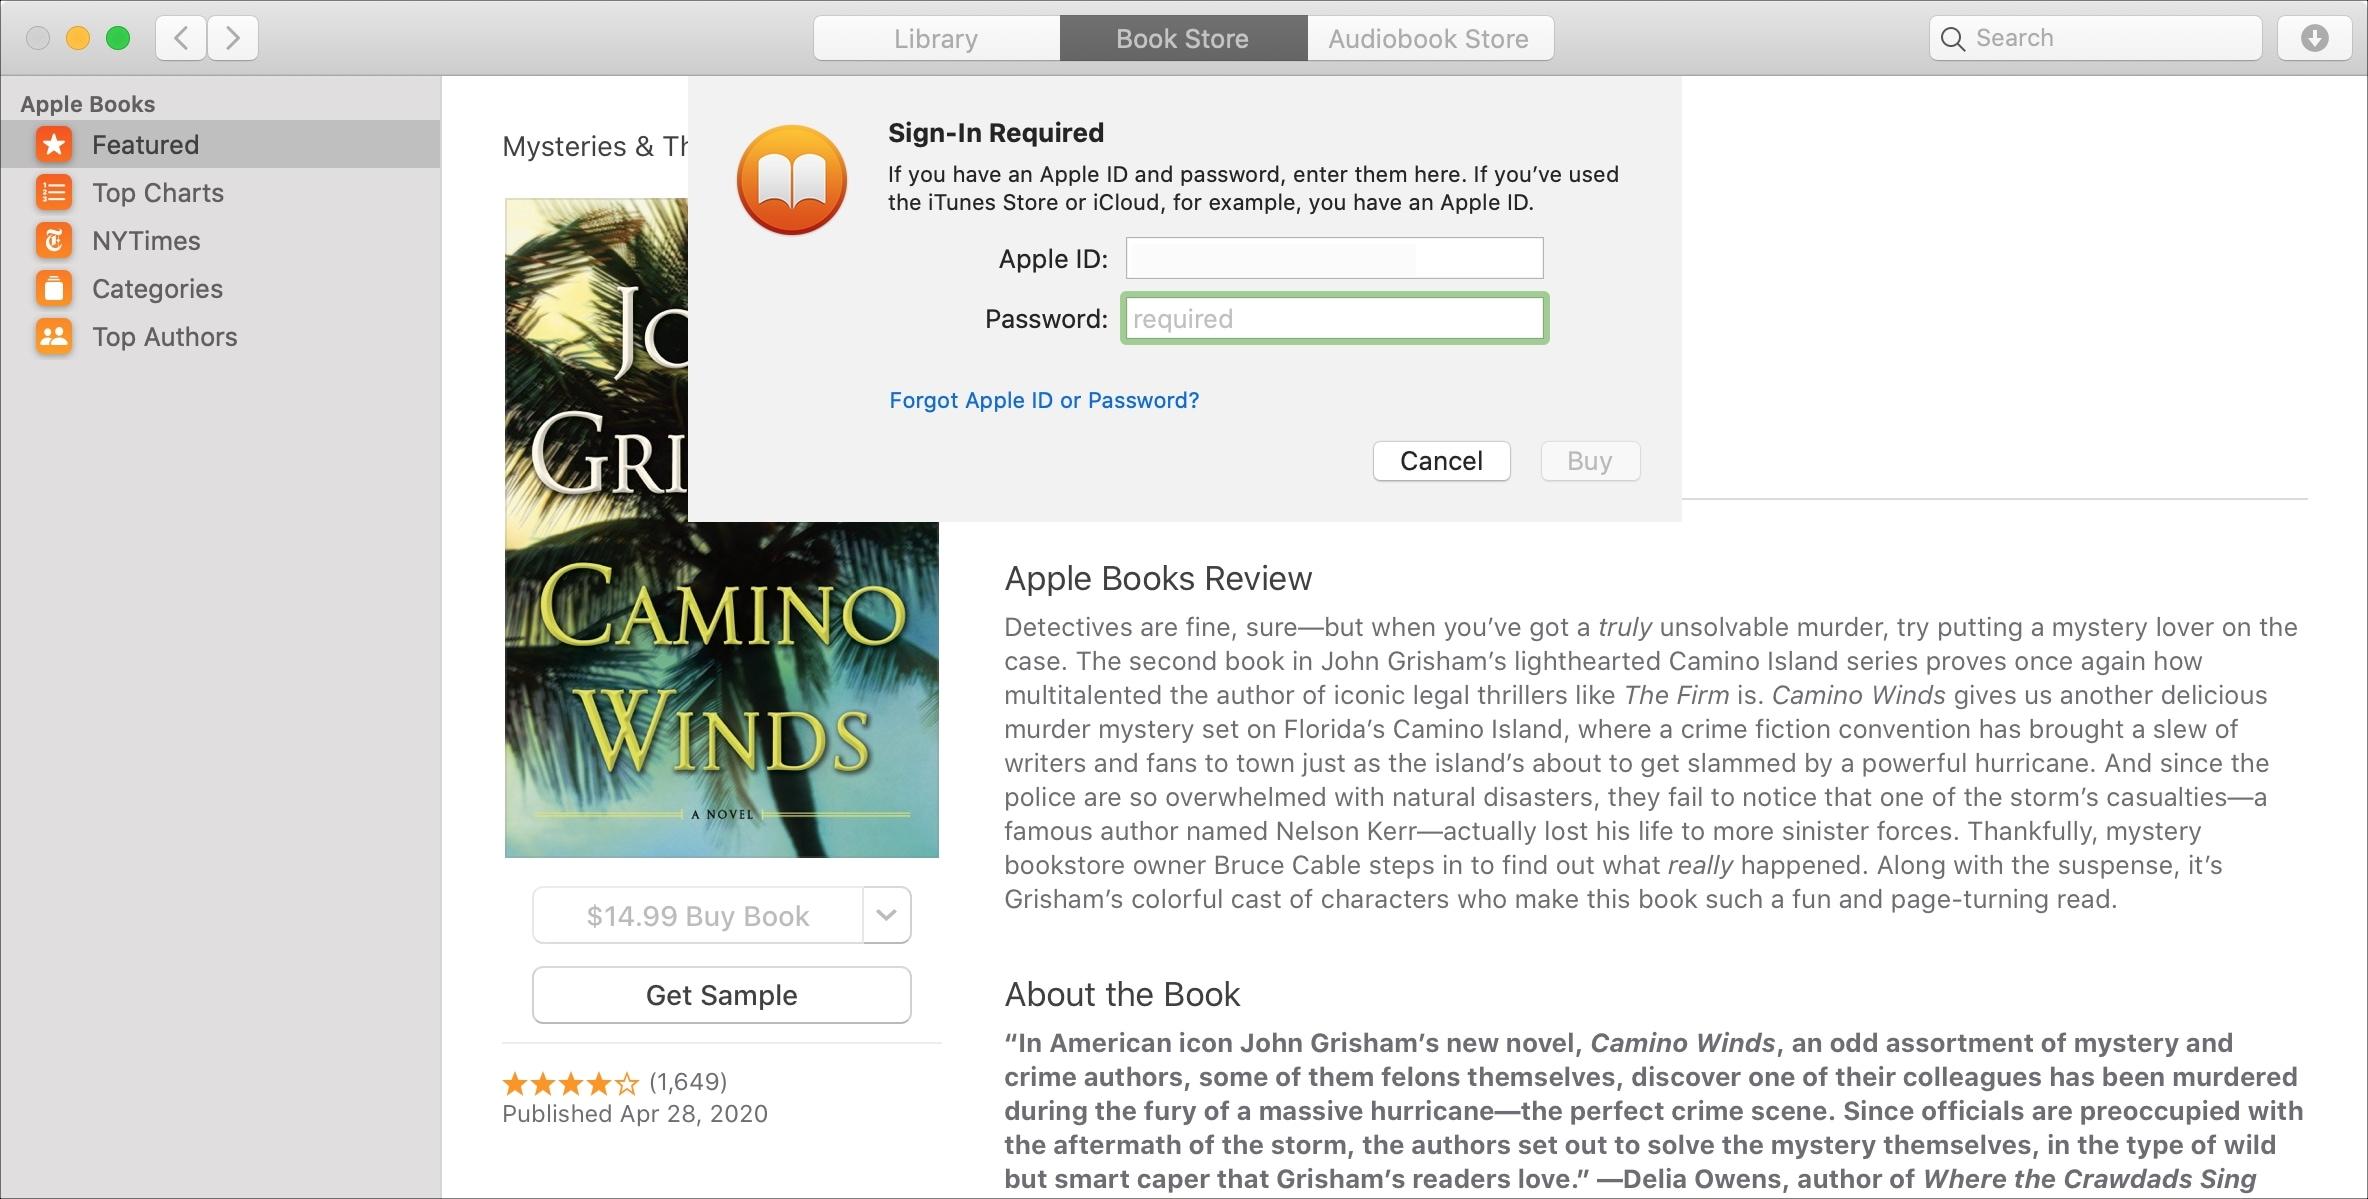 Mac Books Password Required